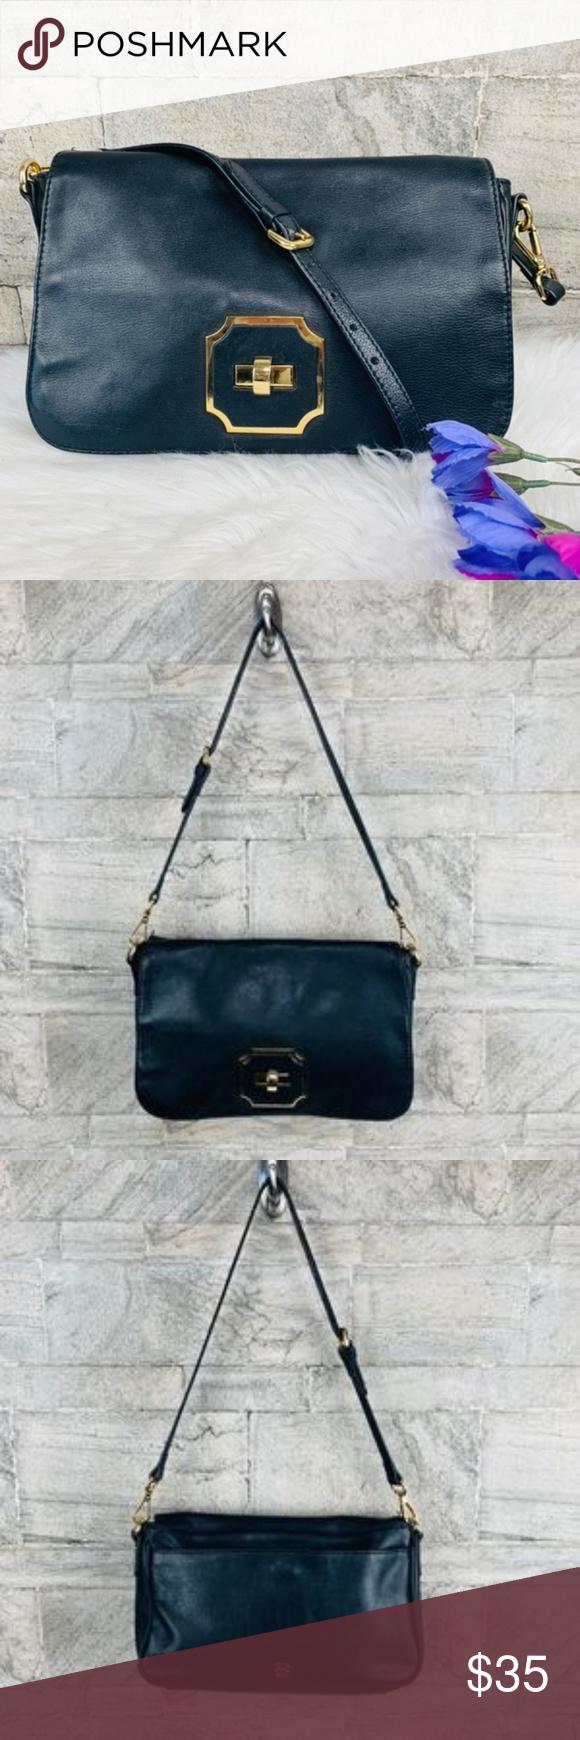 Monet Black Leather Shoulder Handbag Purse Leather Shoulder Handbags Shoulder Handbags Black Leather [ 1740 x 580 Pixel ]